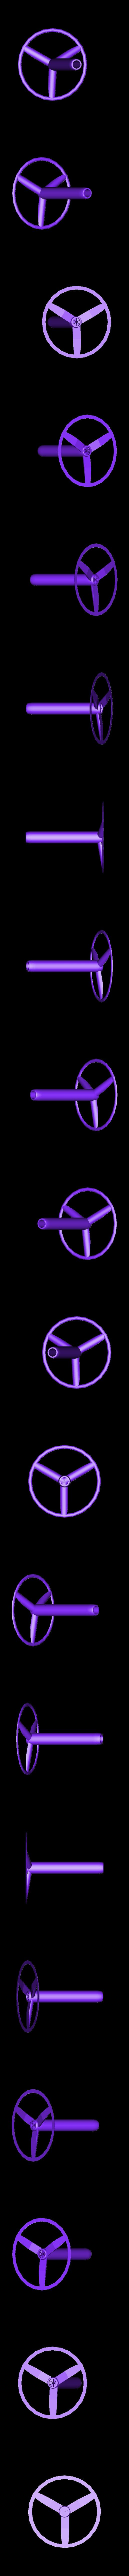 porte sopalin.stl Download free STL file paper towel holder wipes everything • 3D printing model, breizhindy